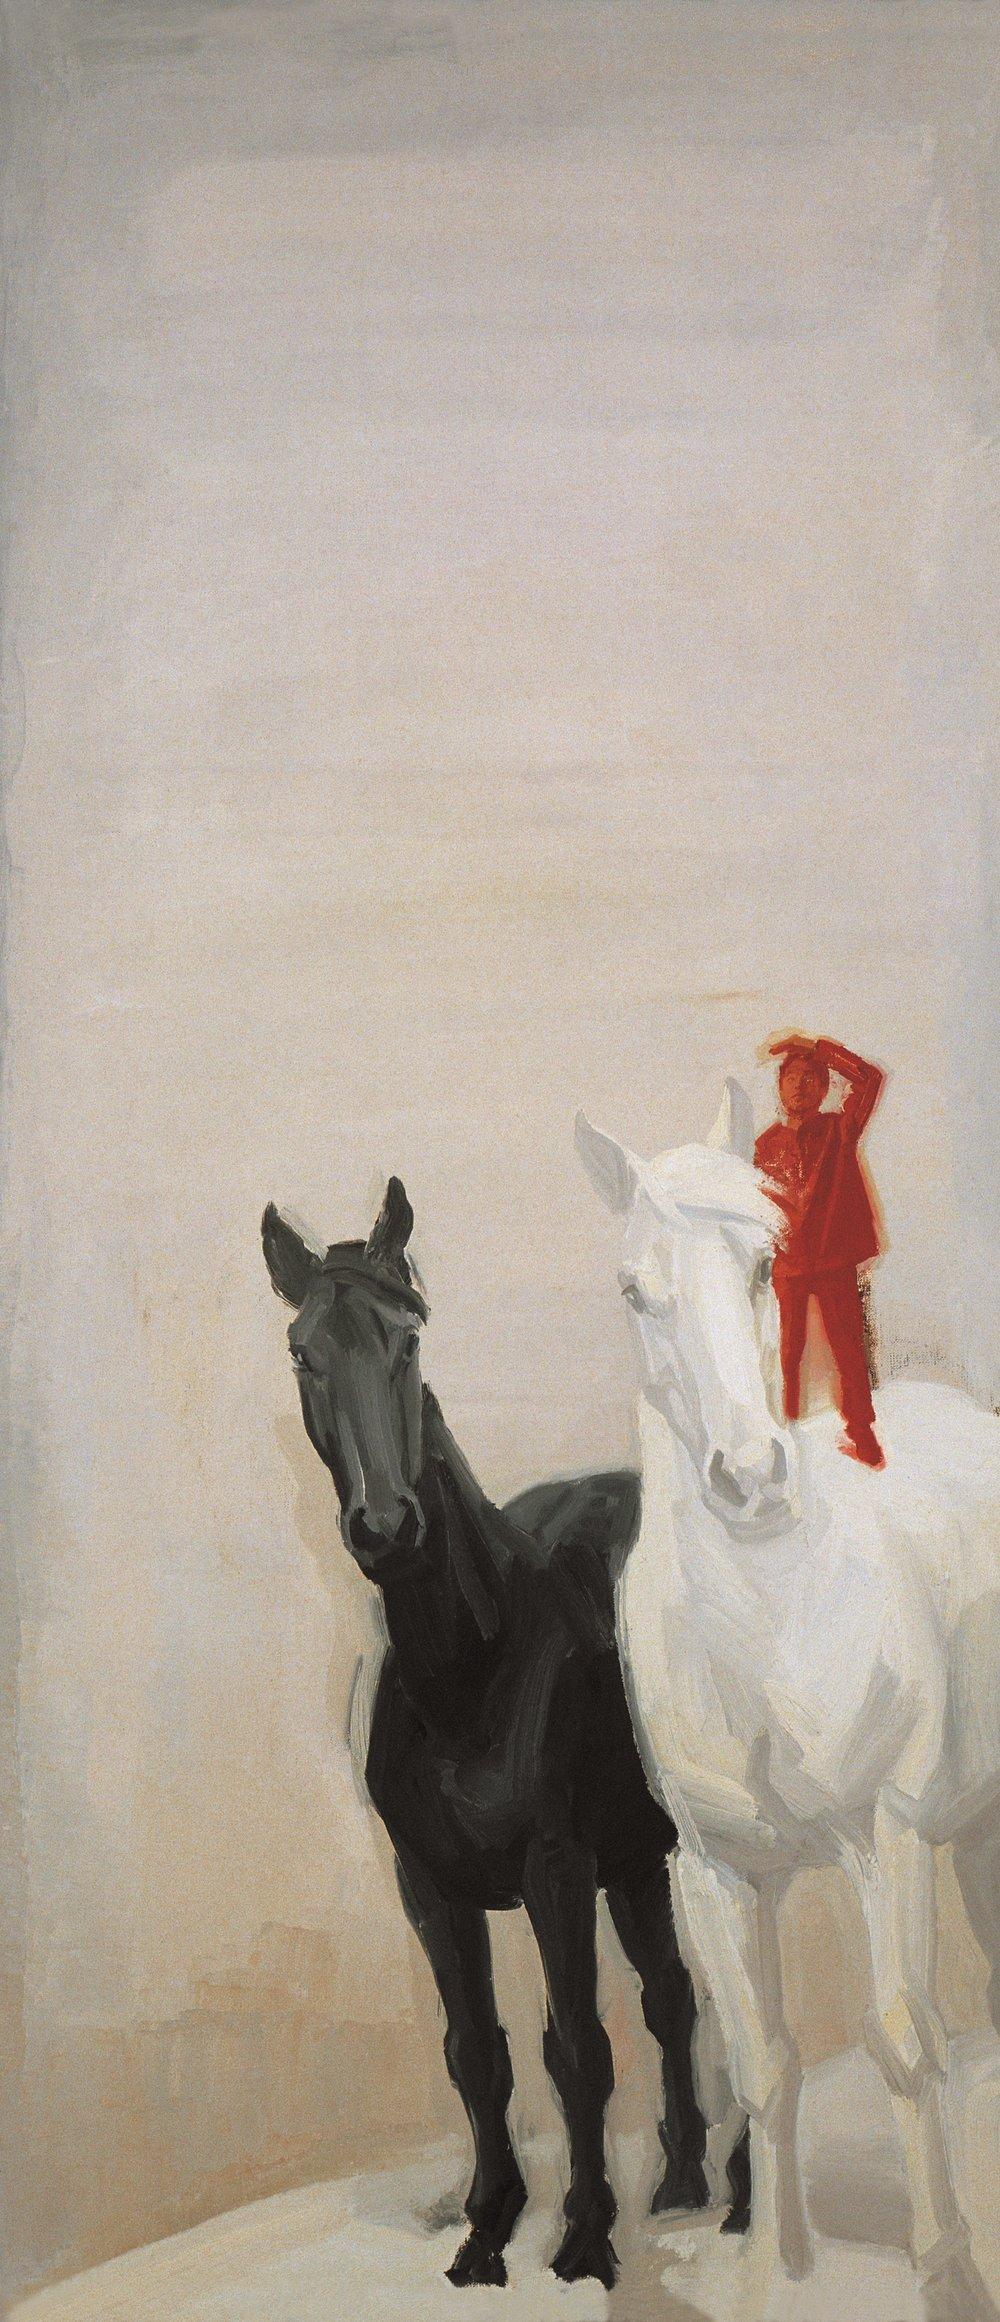 13.   The Dreams: Lookout,  75x50cm   Silk Print  2010                                         梦 --- 眺望   丝网版画.jpg